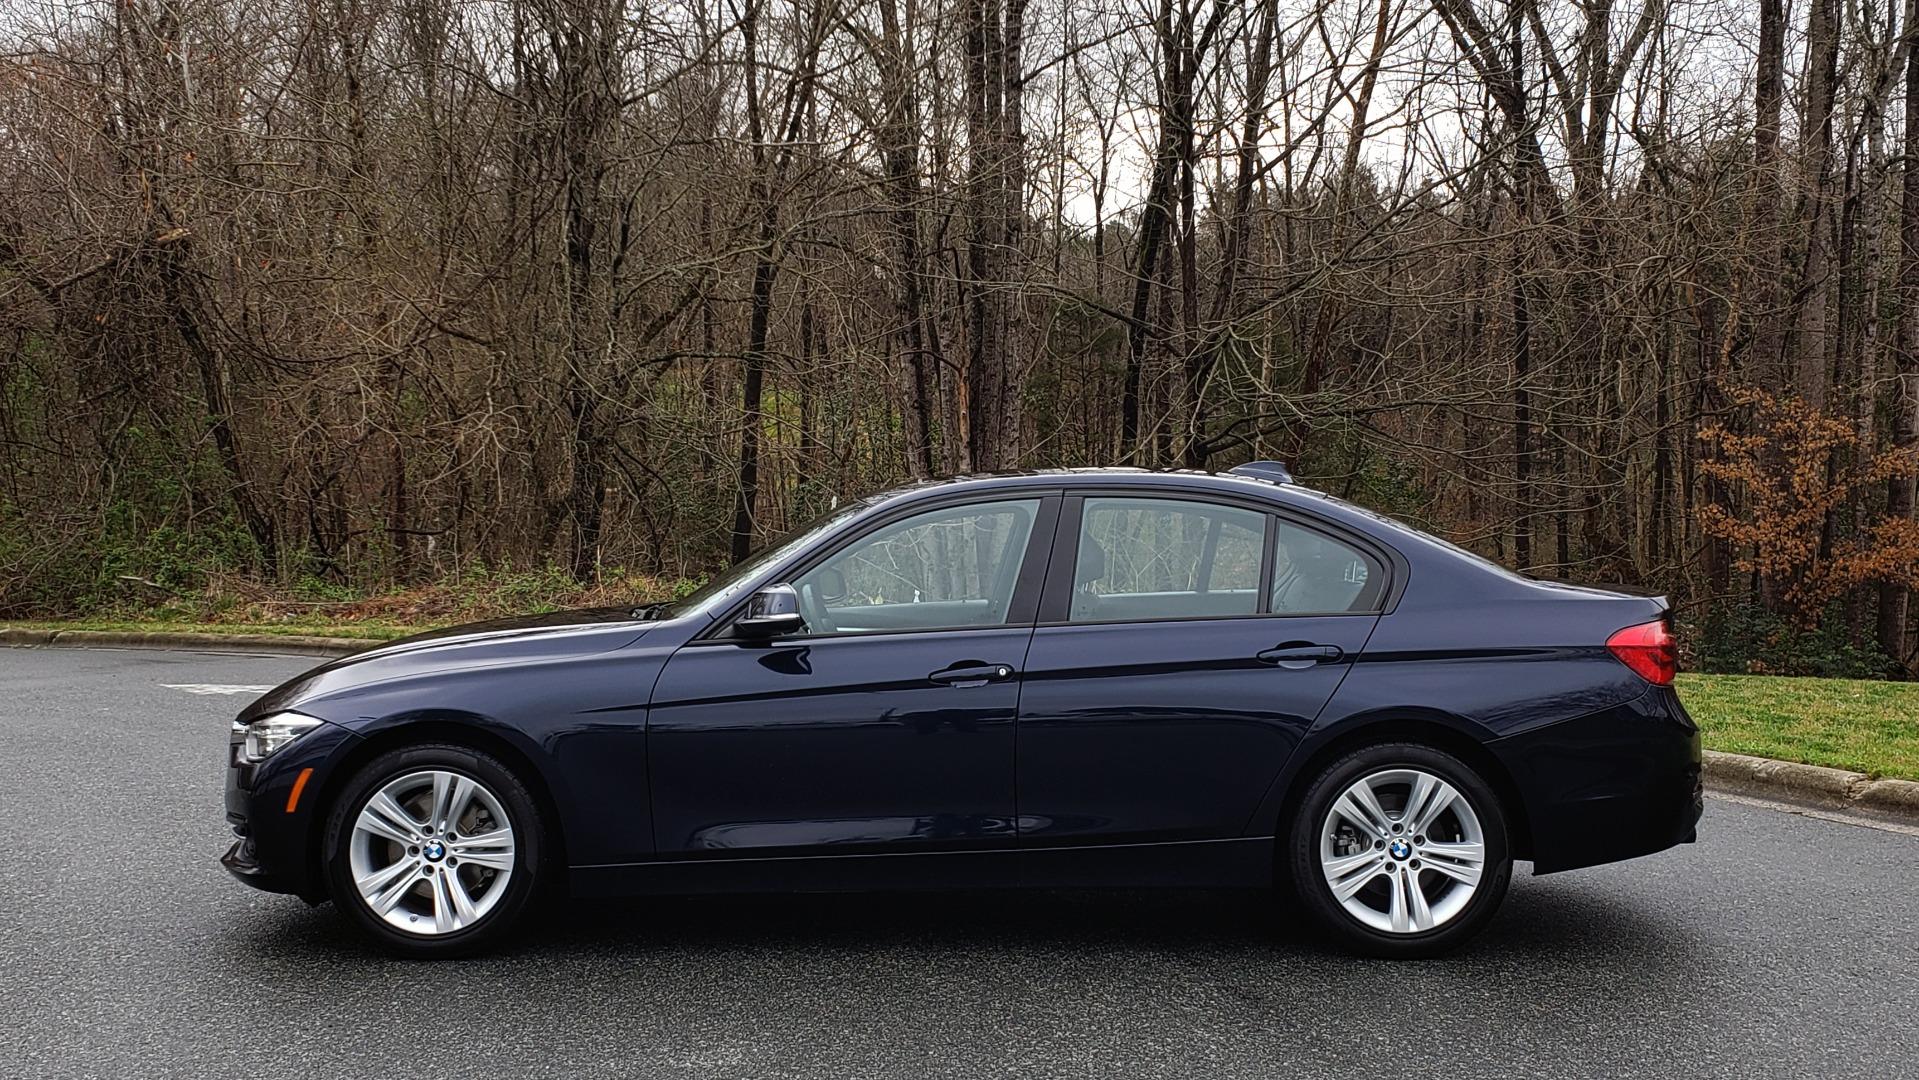 Used 2016 BMW 3 SERIES 328I PREMIUM PKG / DRVR ASST / SUNROOF / PARK ASST for sale Sold at Formula Imports in Charlotte NC 28227 2